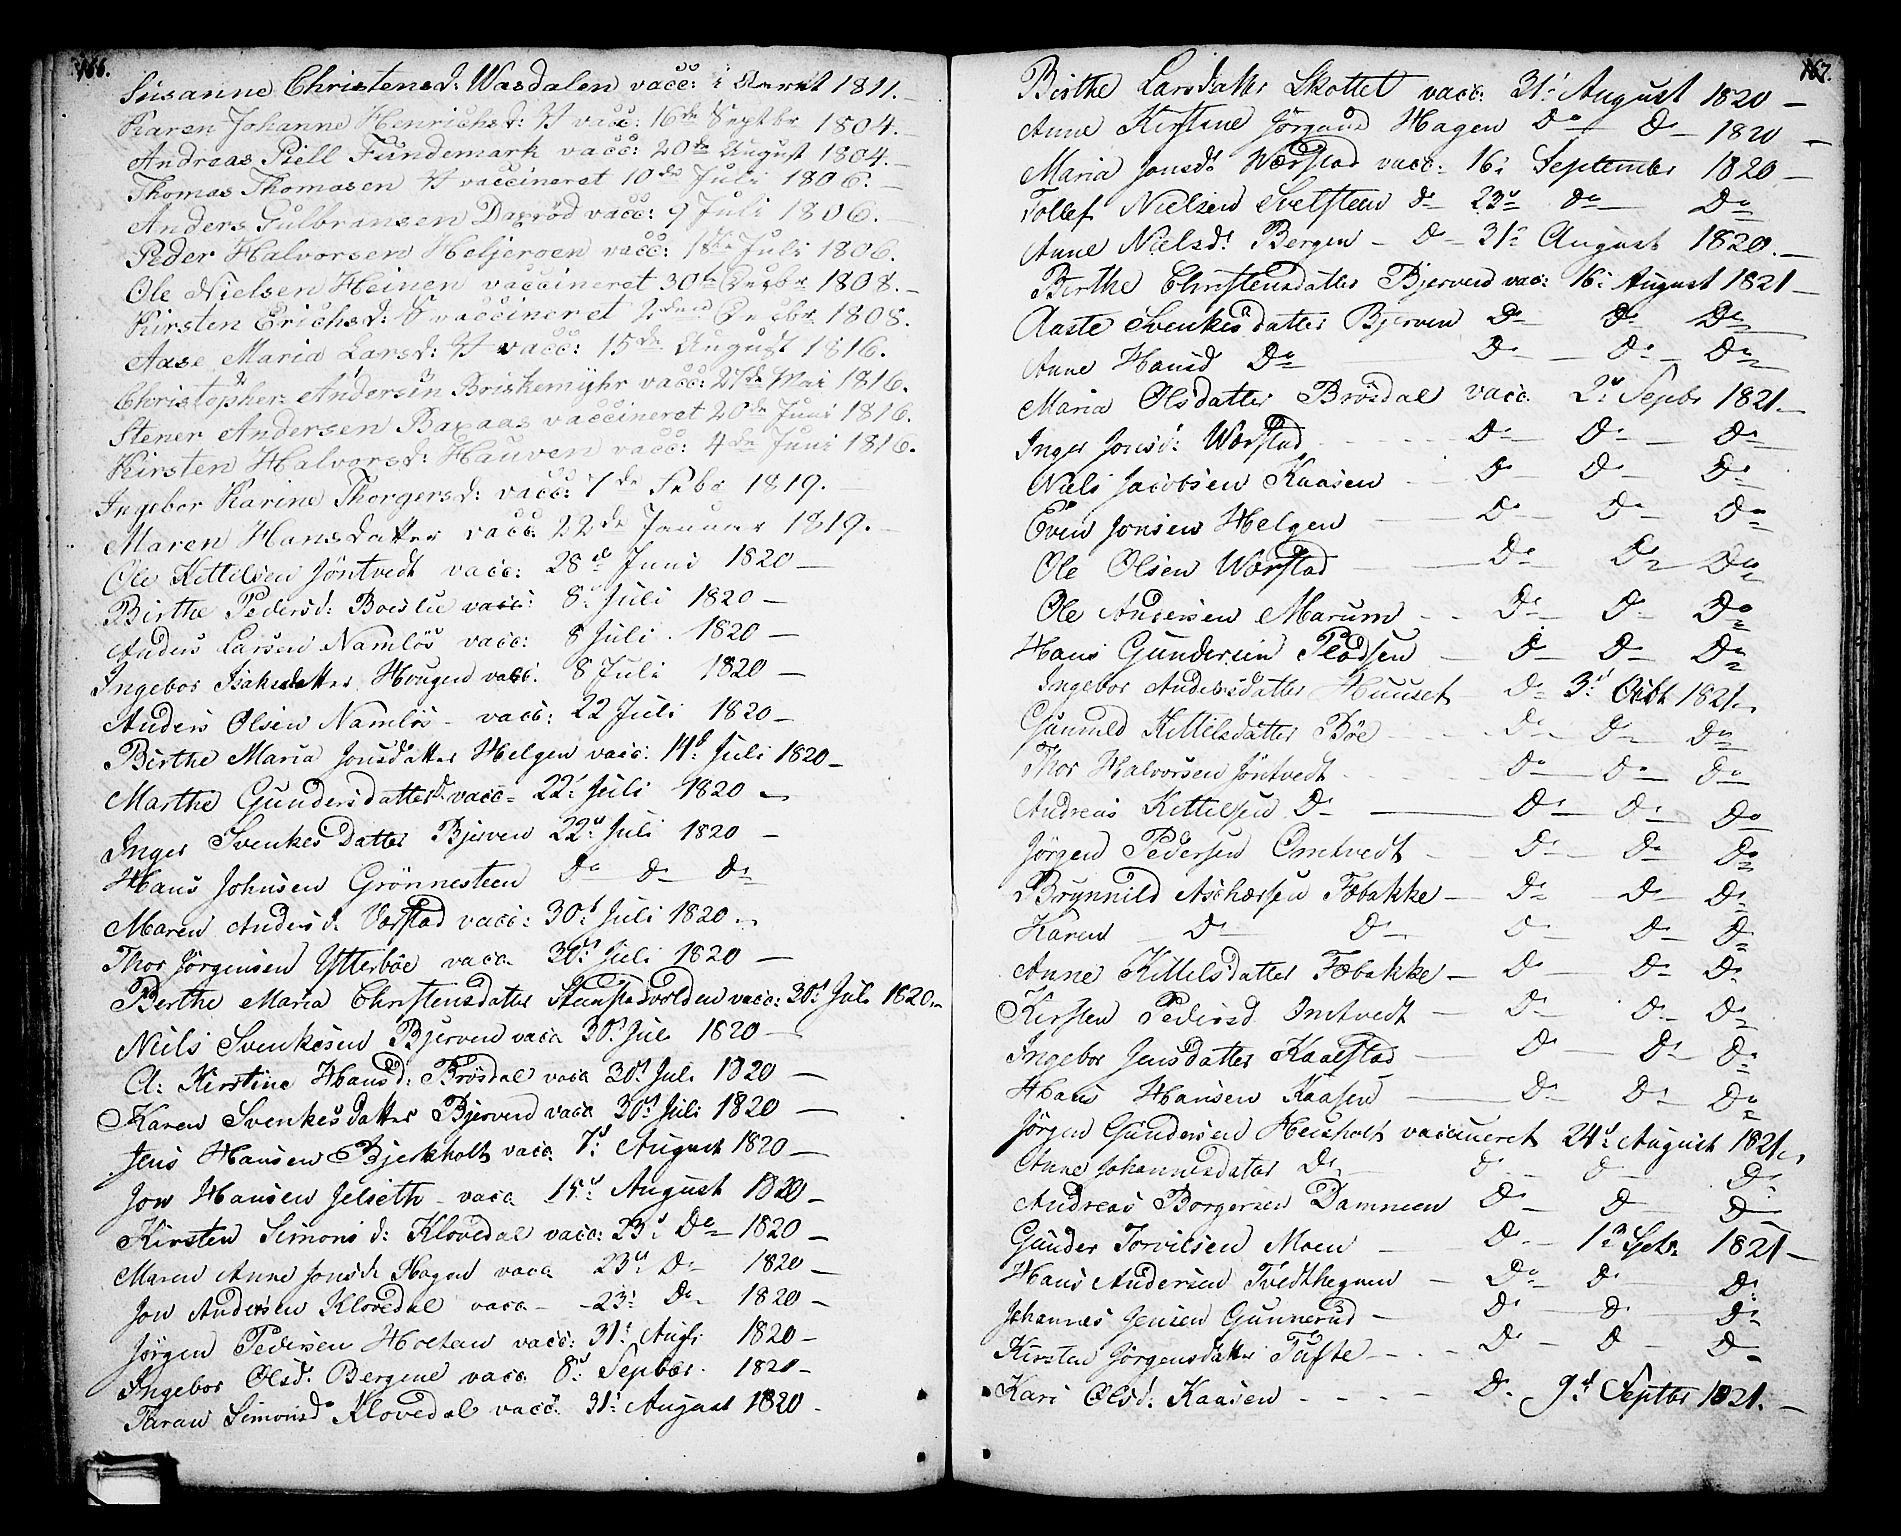 SAKO, Holla kirkebøker, F/Fa/L0002: Ministerialbok nr. 2, 1779-1814, s. 166-167